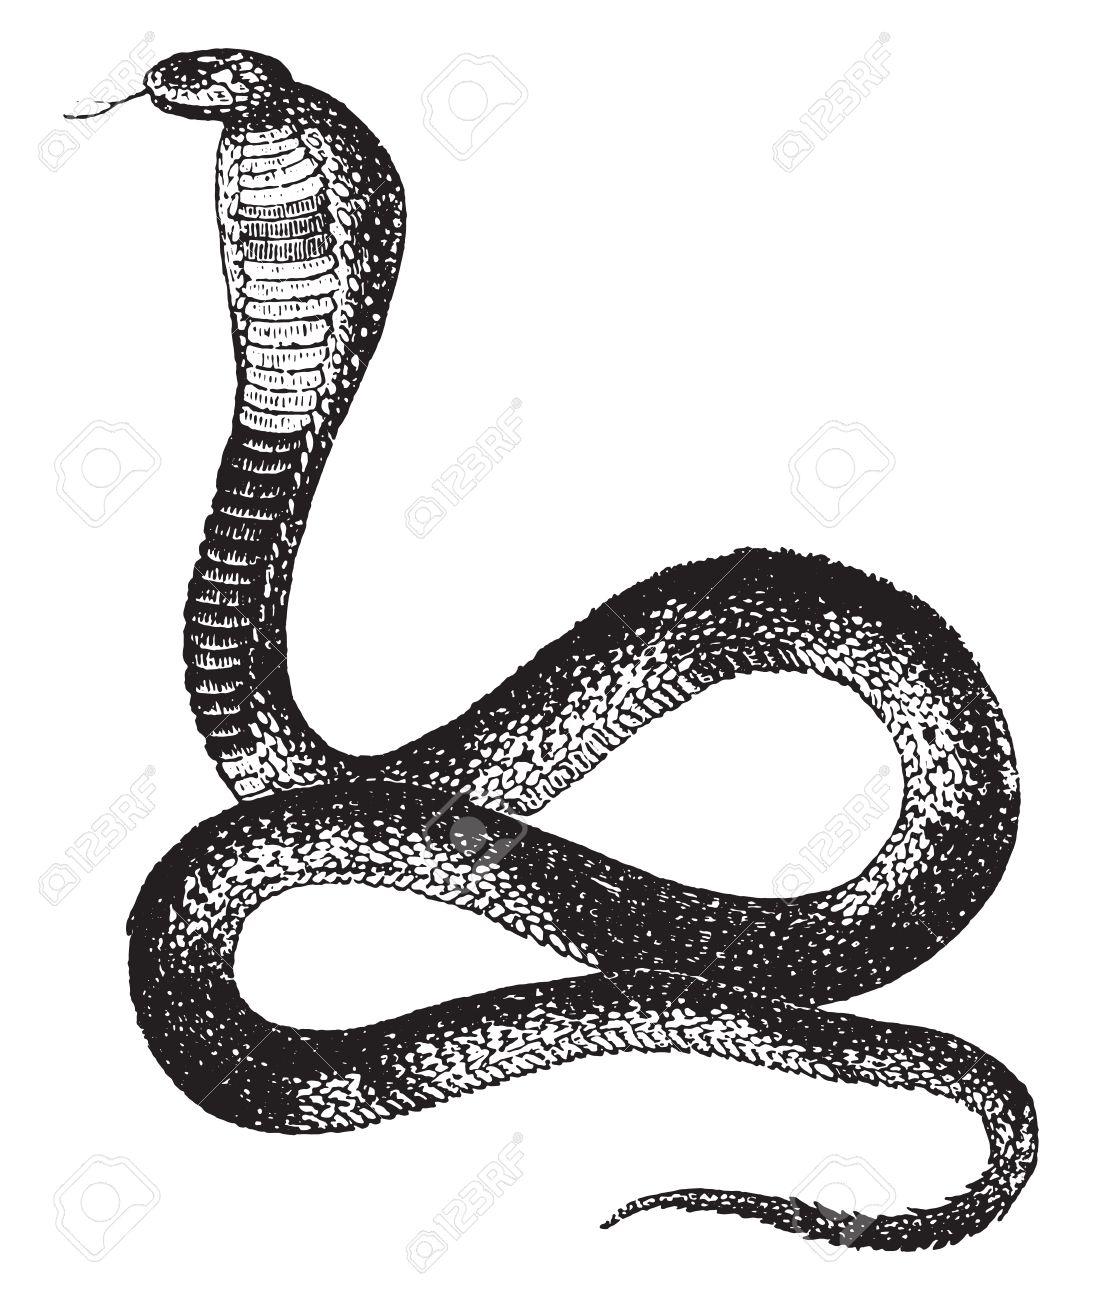 Naja or cobra, vintage engraved illustration. Natural History of Animals, 1880. - 41790464